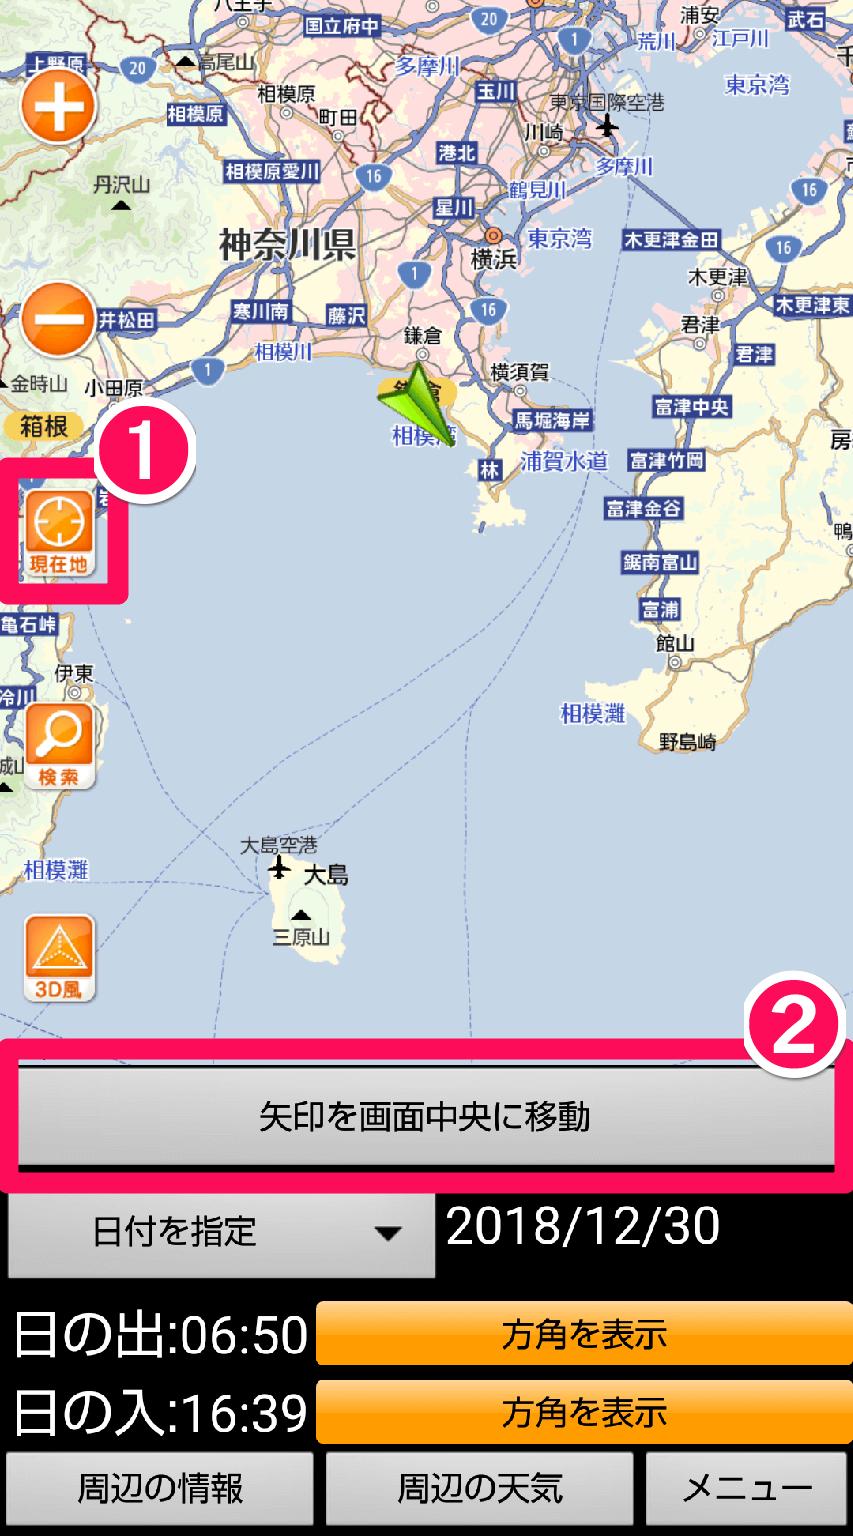 Android(アンドロイド)版[日の出日の入マピオン]アプリ地図の画面